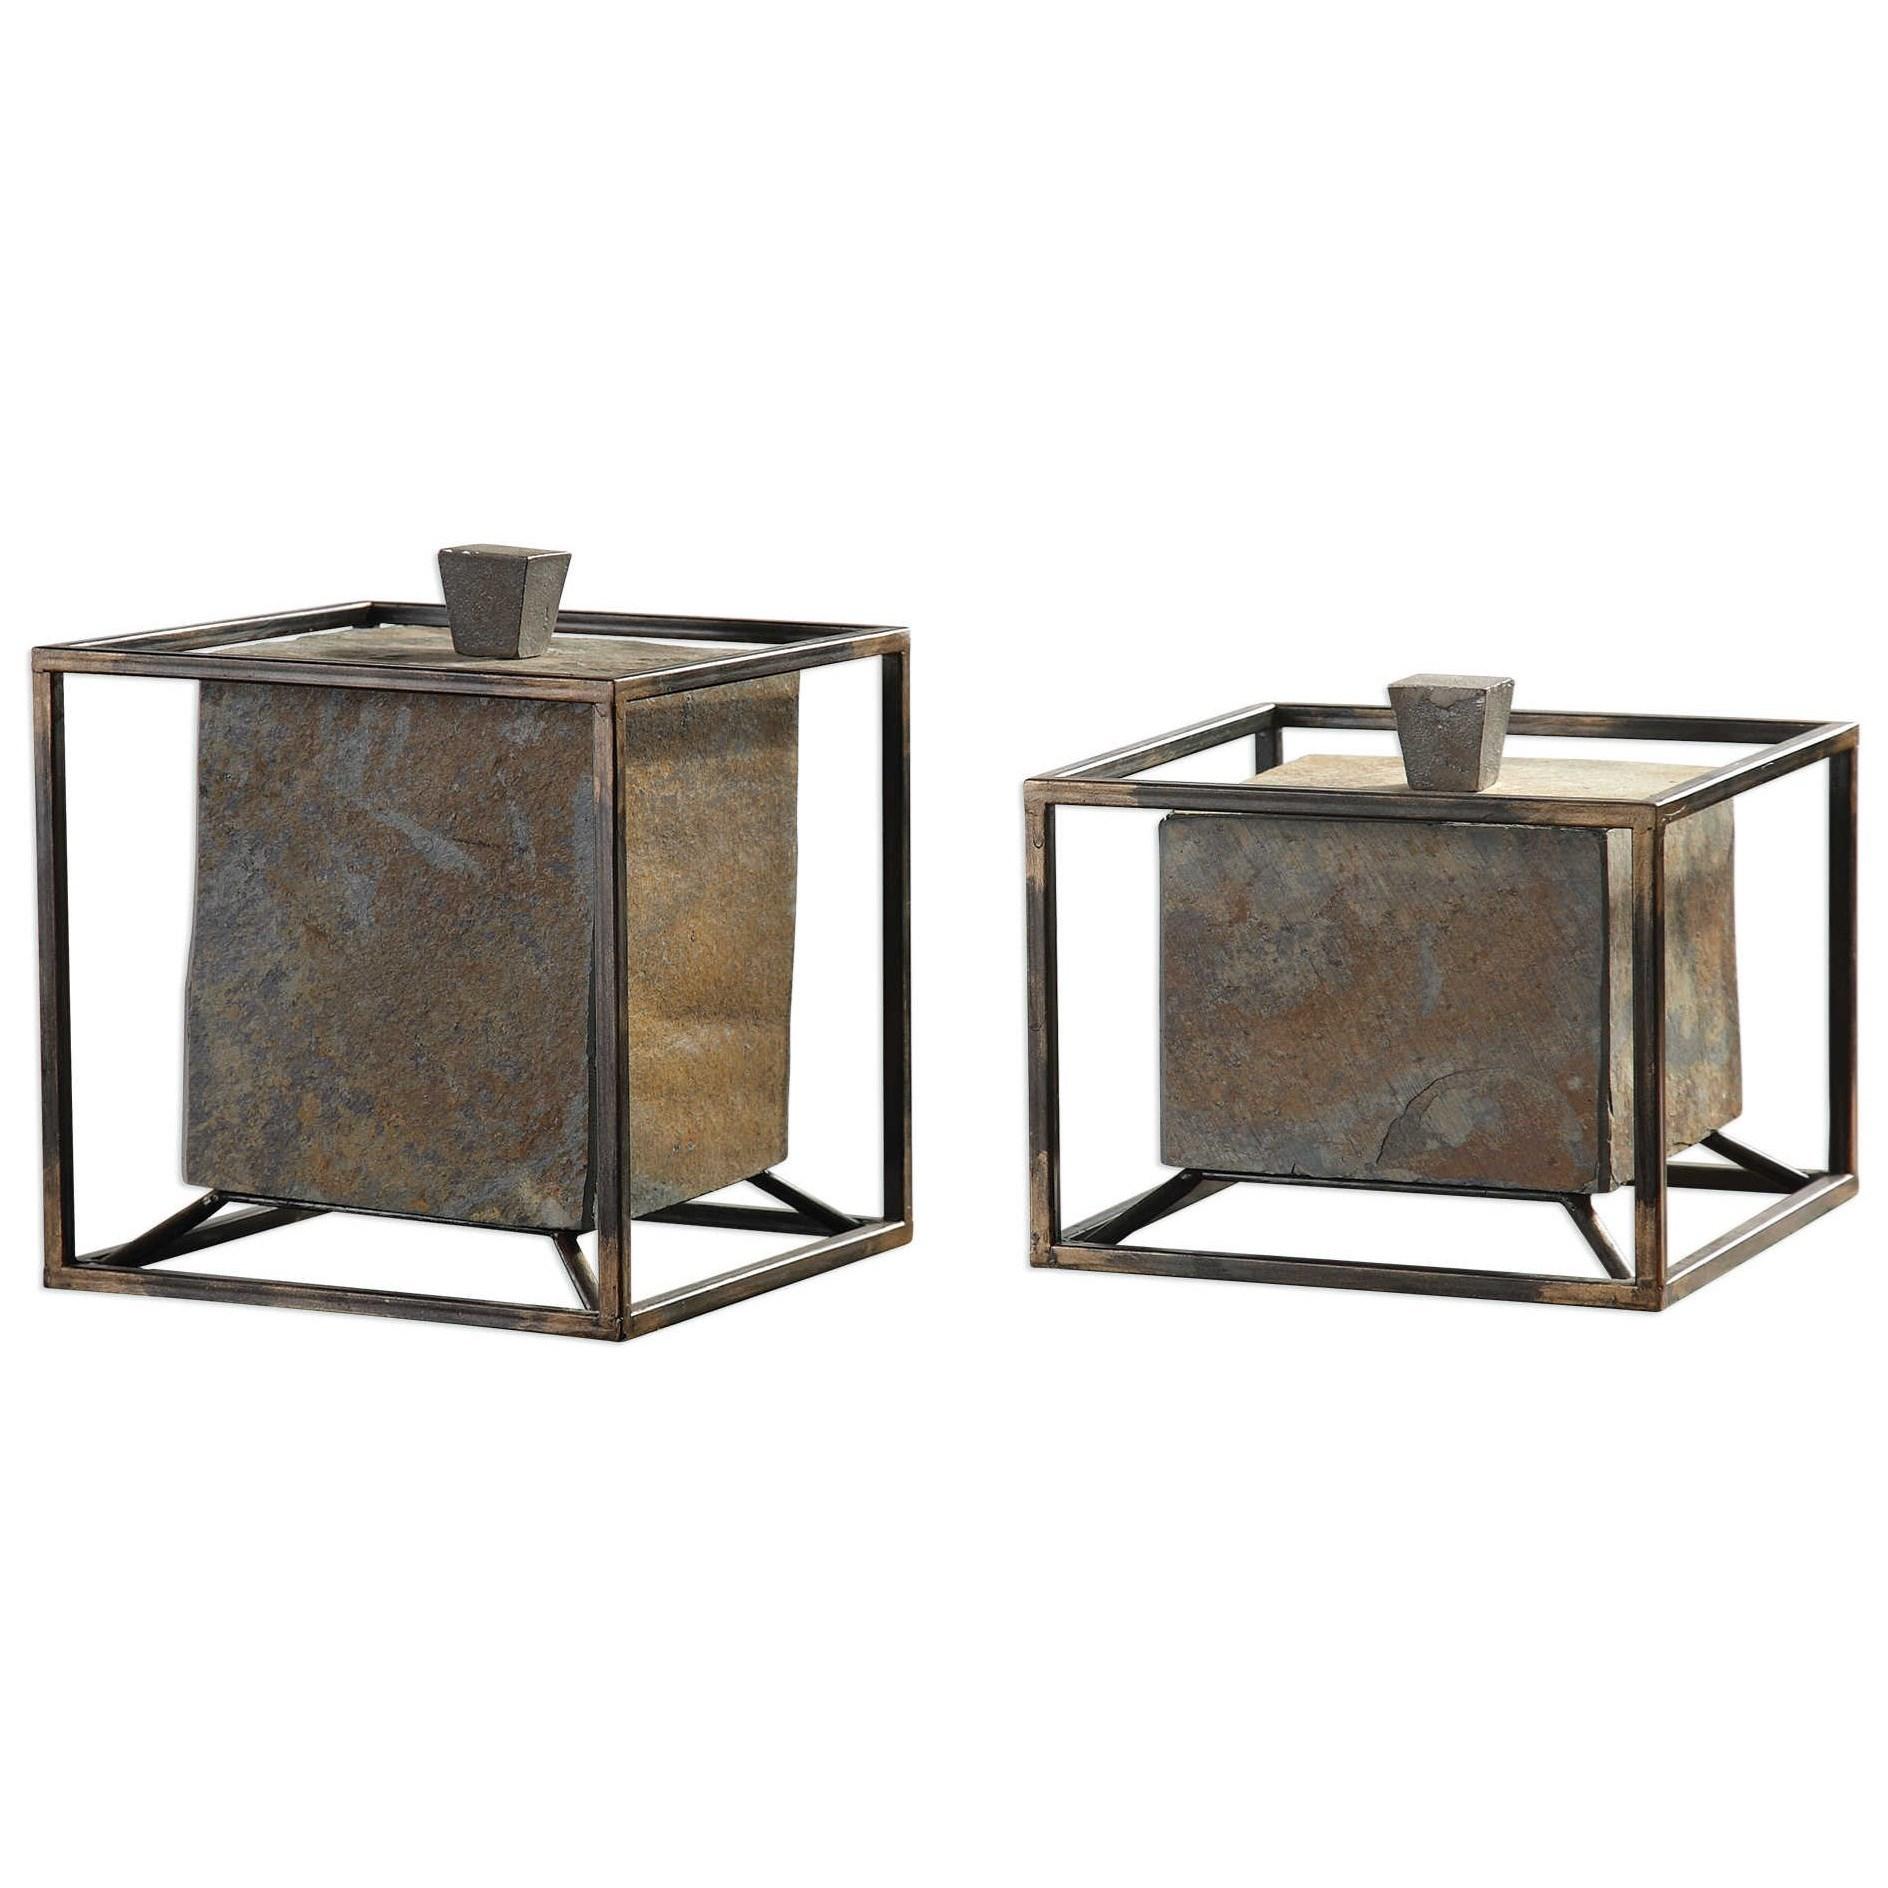 uttermost accessories slate cube boxes set of 2 mueller furniture boxes. Black Bedroom Furniture Sets. Home Design Ideas